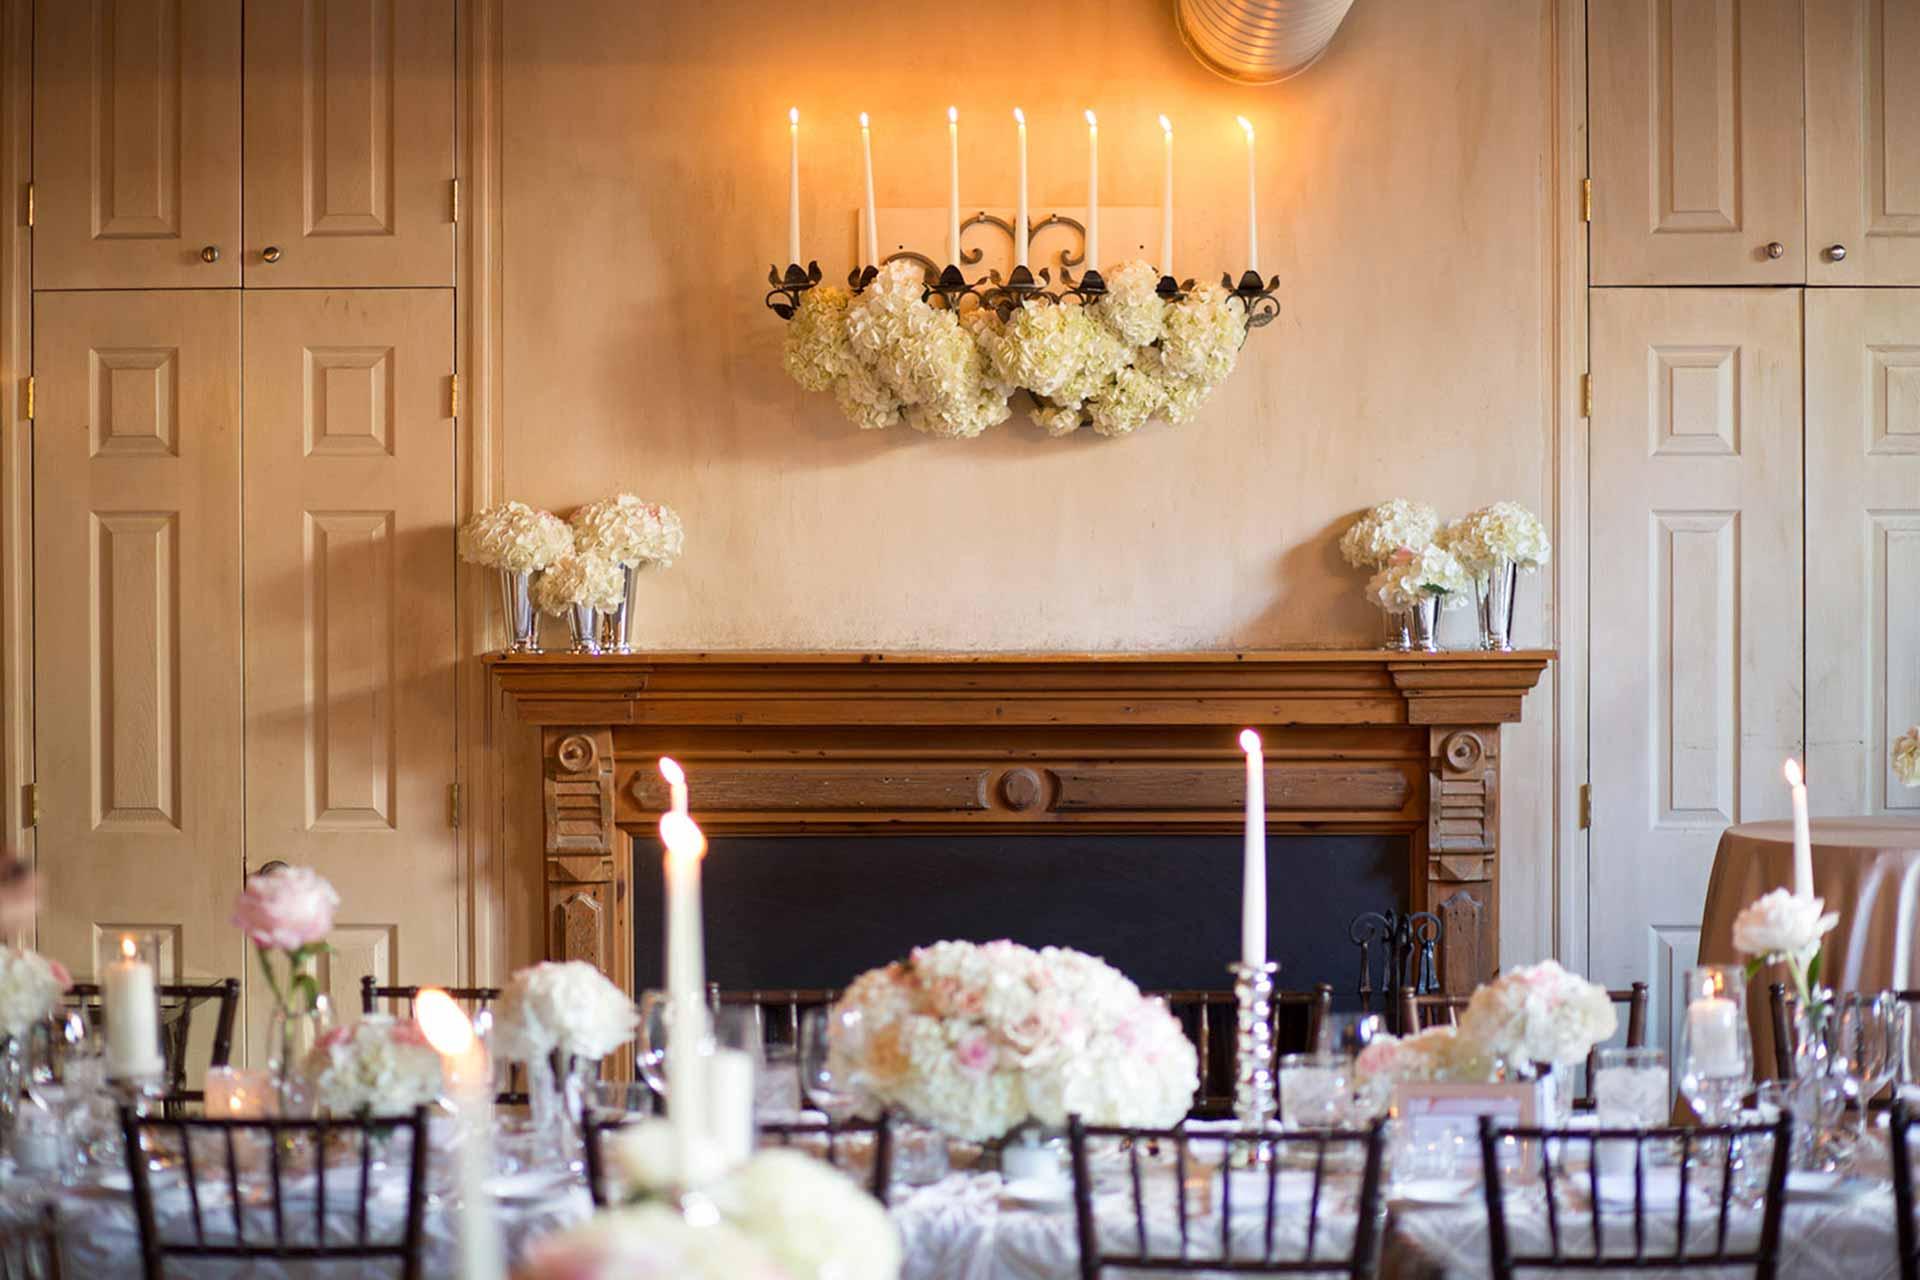 Toronto Wedding Venue - Restaurant Reception - Elegant Head Table and Fireplace